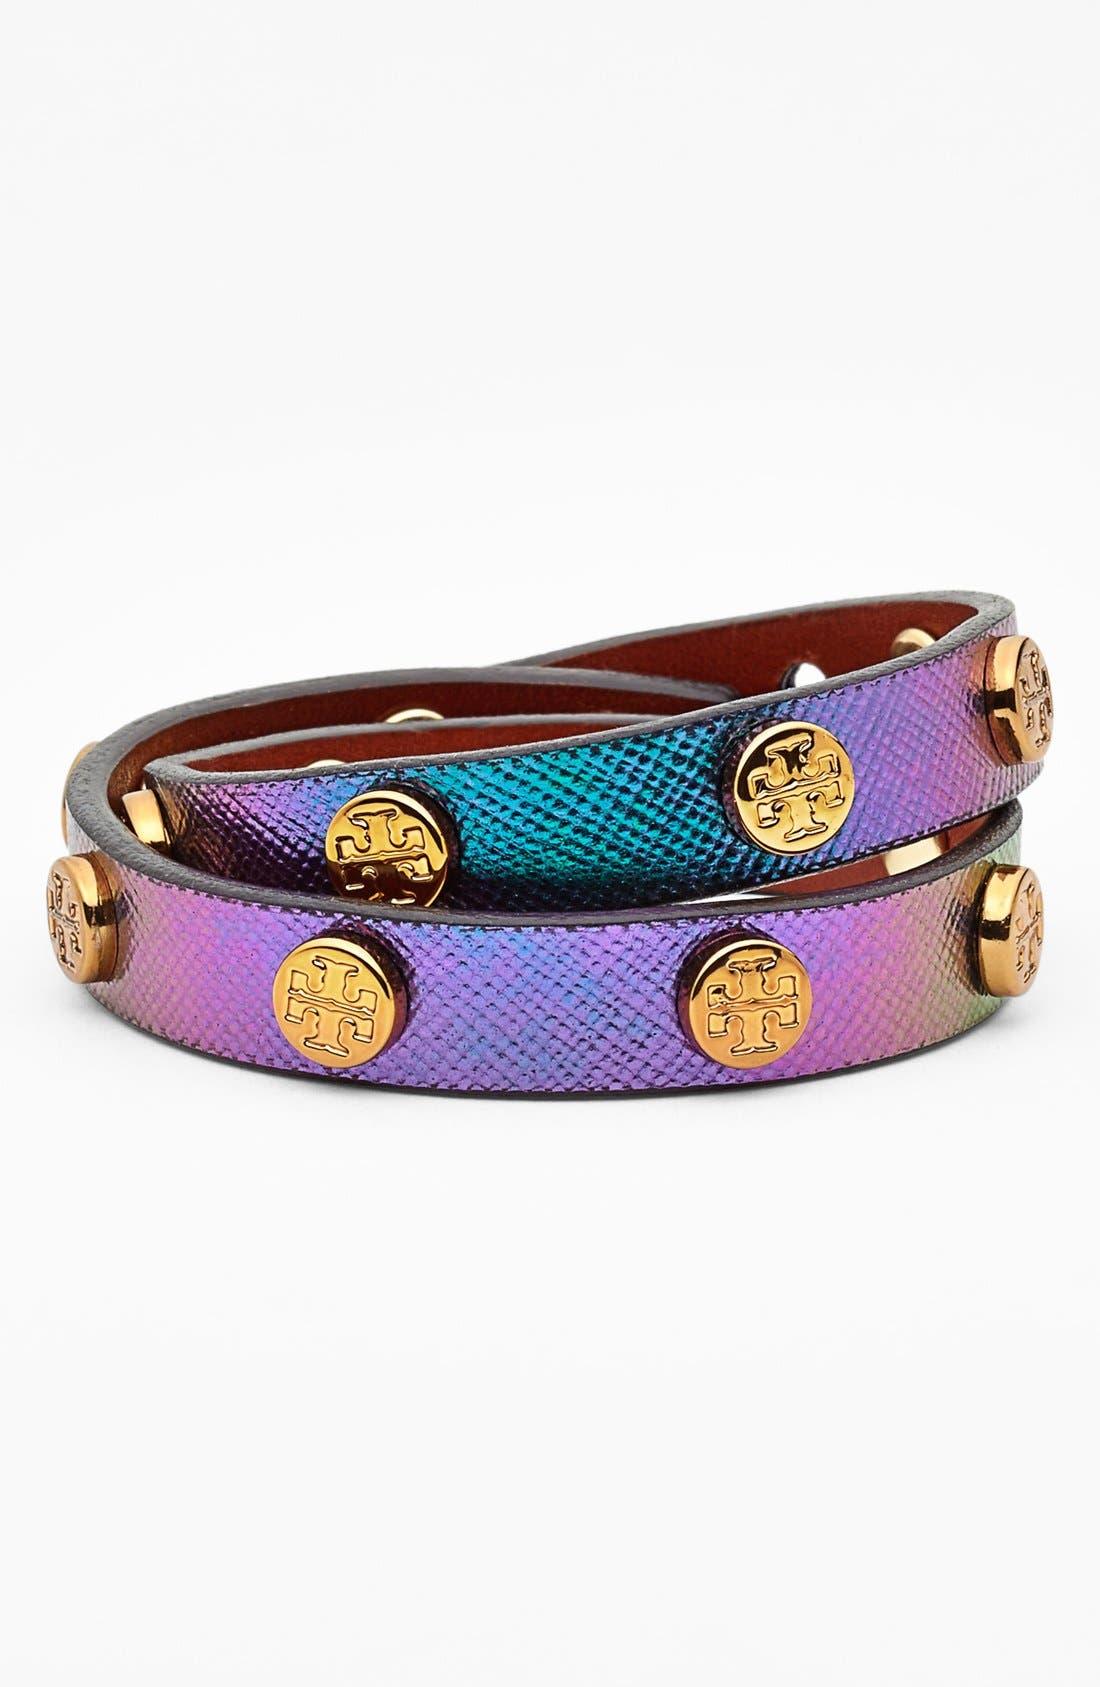 Alternate Image 1 Selected - Tory Burch Logo Hologram Leather Wrap Bracelet